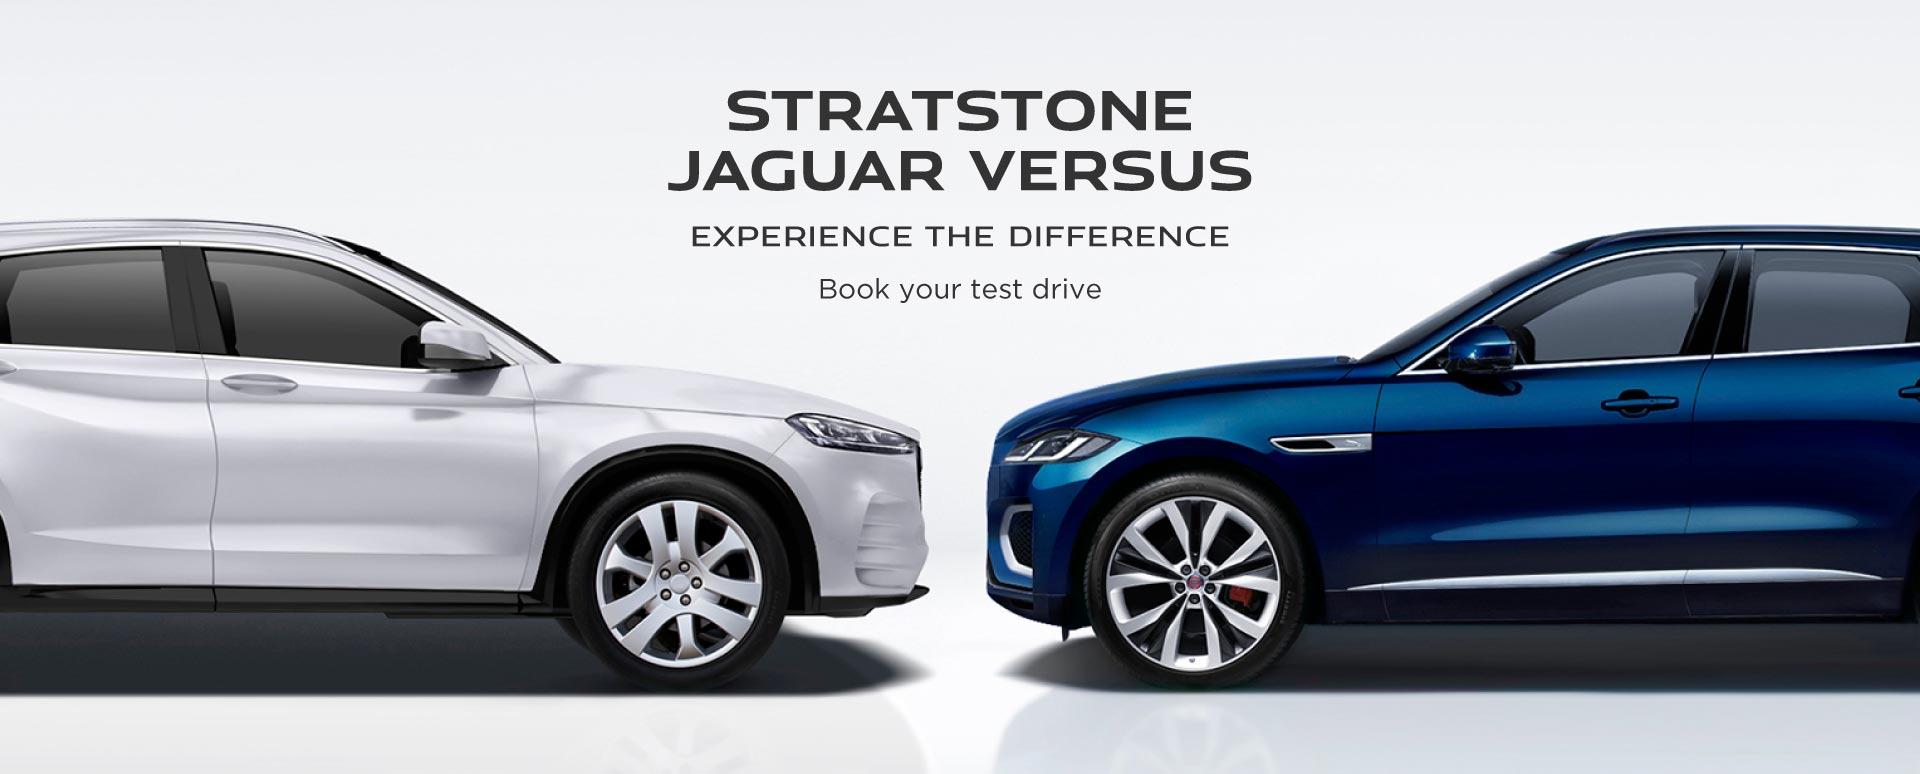 Jaguar Versus: Arrive and Drive Event